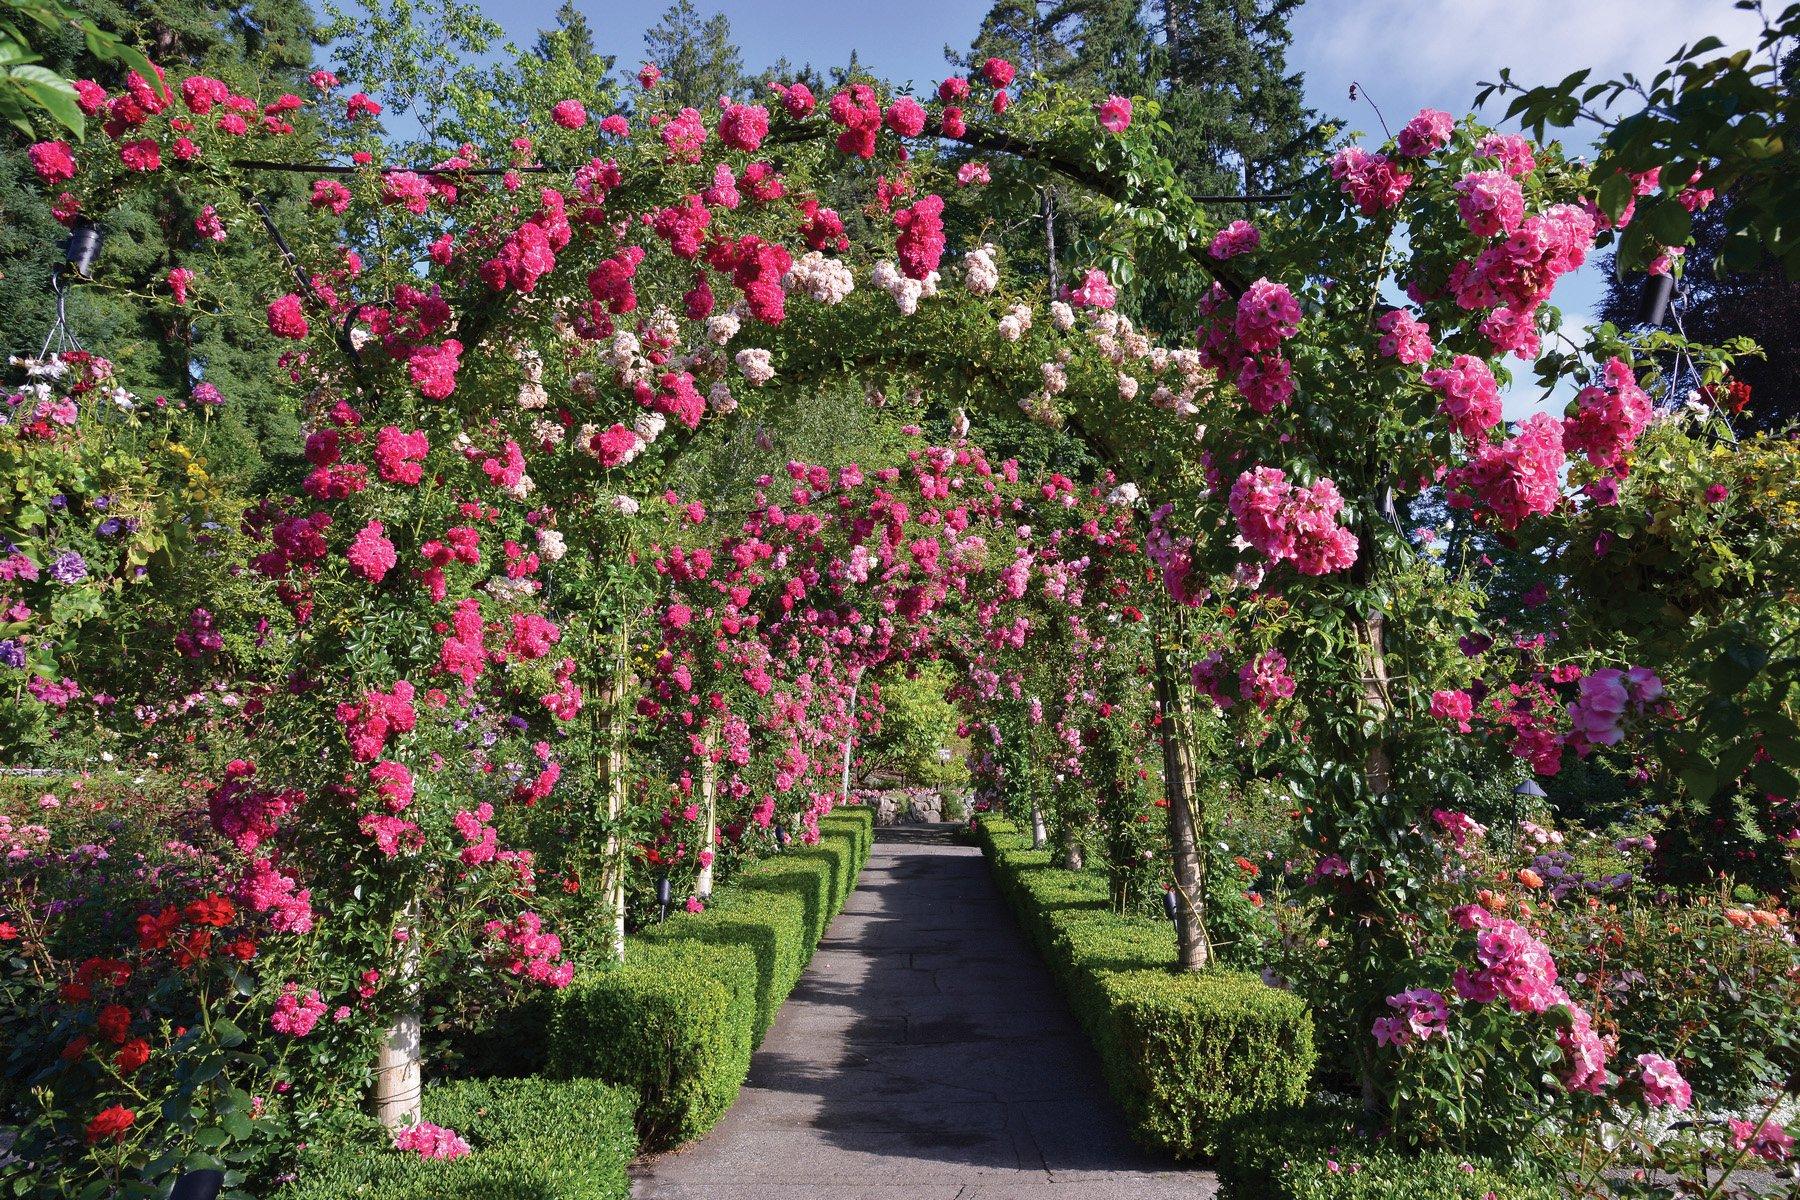 The Butchart Gardens Victoria British Columbia